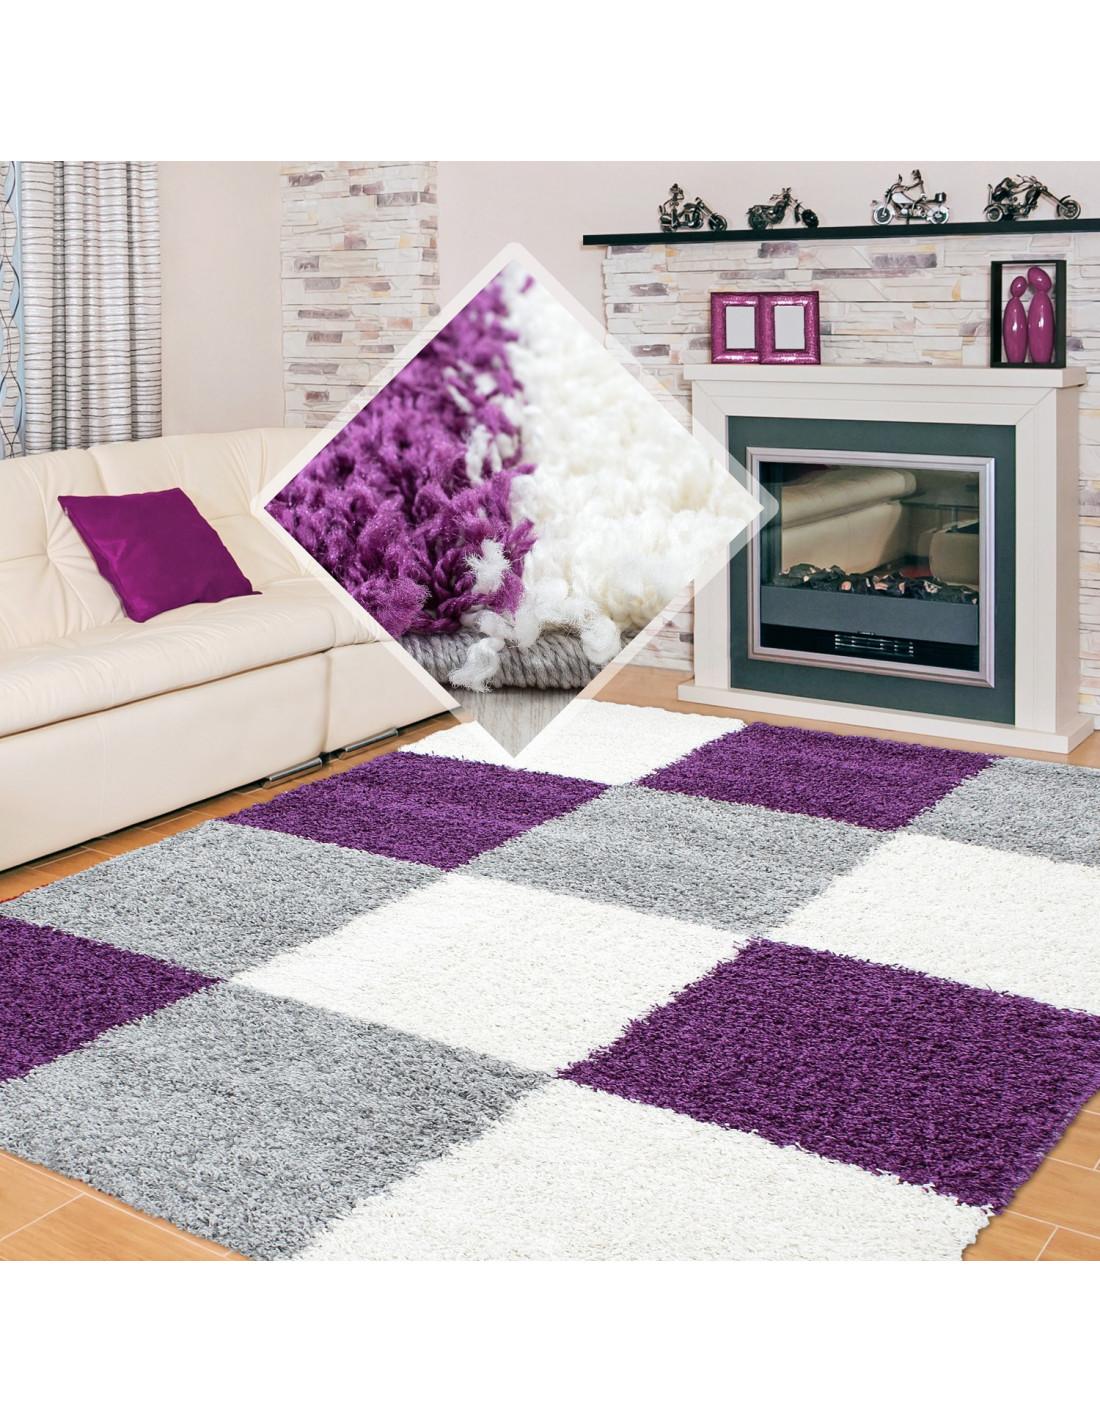 Shaggy carpet pile height 3cm checkered purple white gray